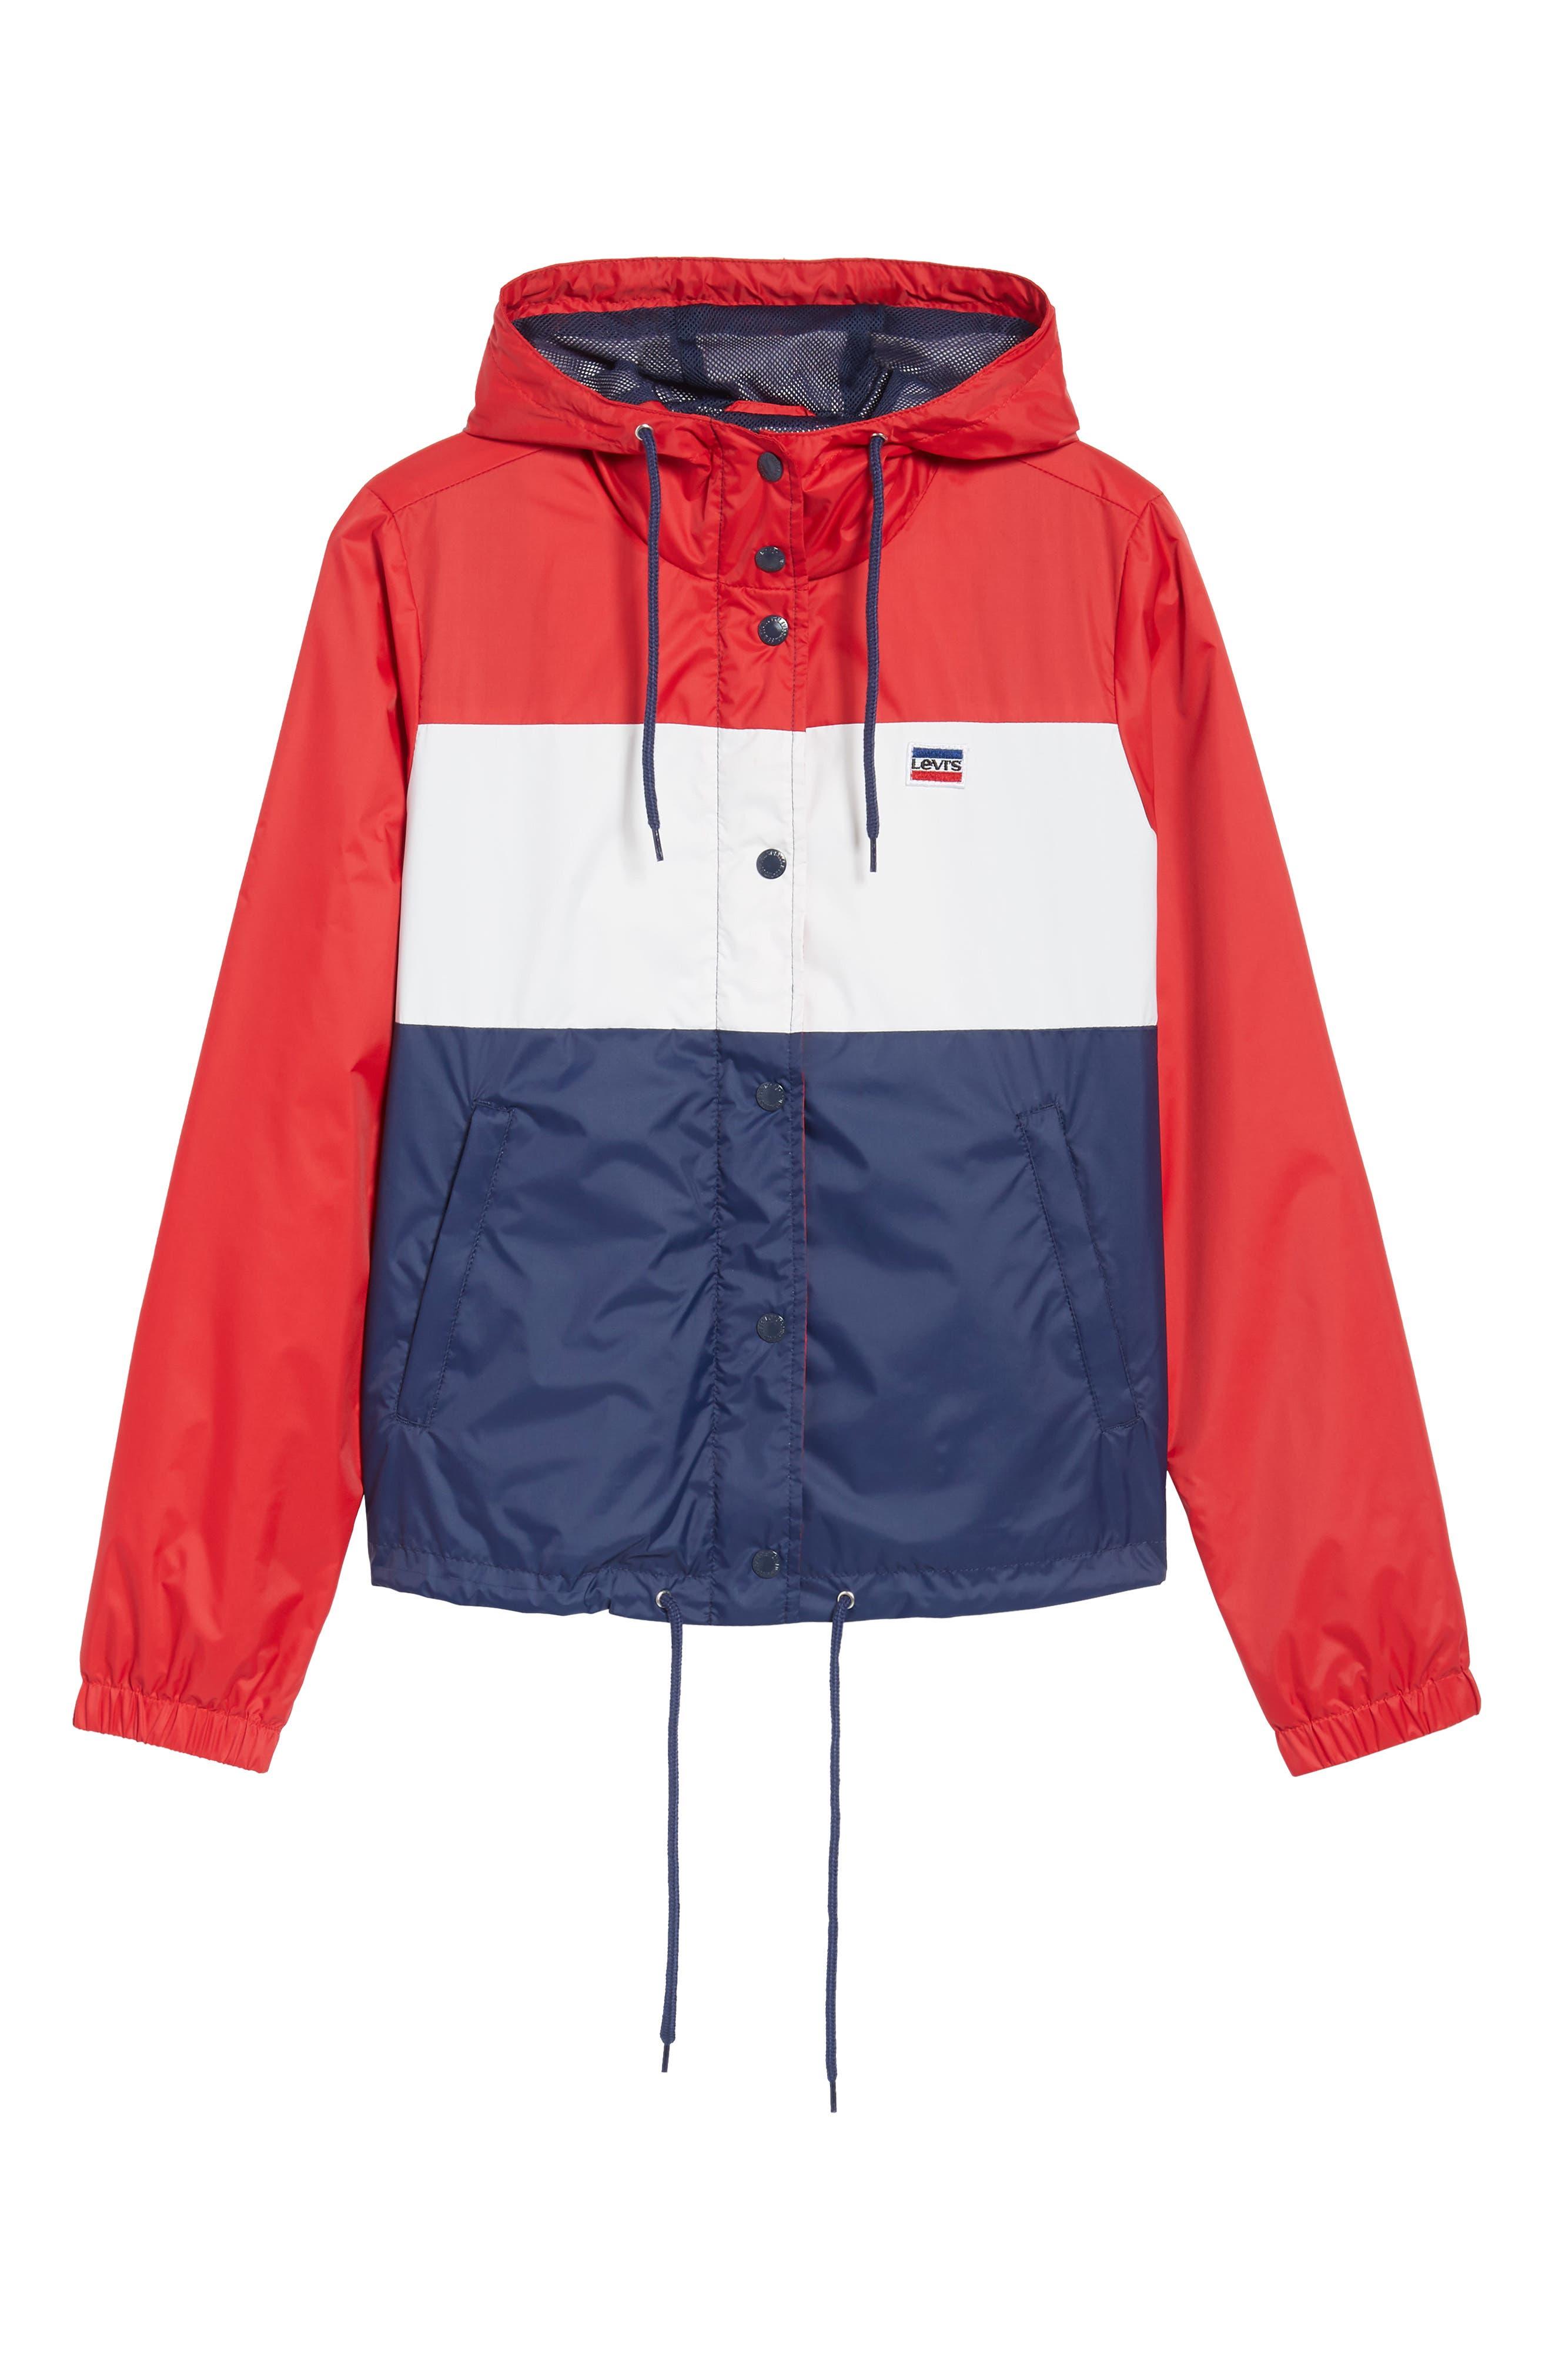 Retro Hooded Coach's Jacket,                             Alternate thumbnail 24, color,